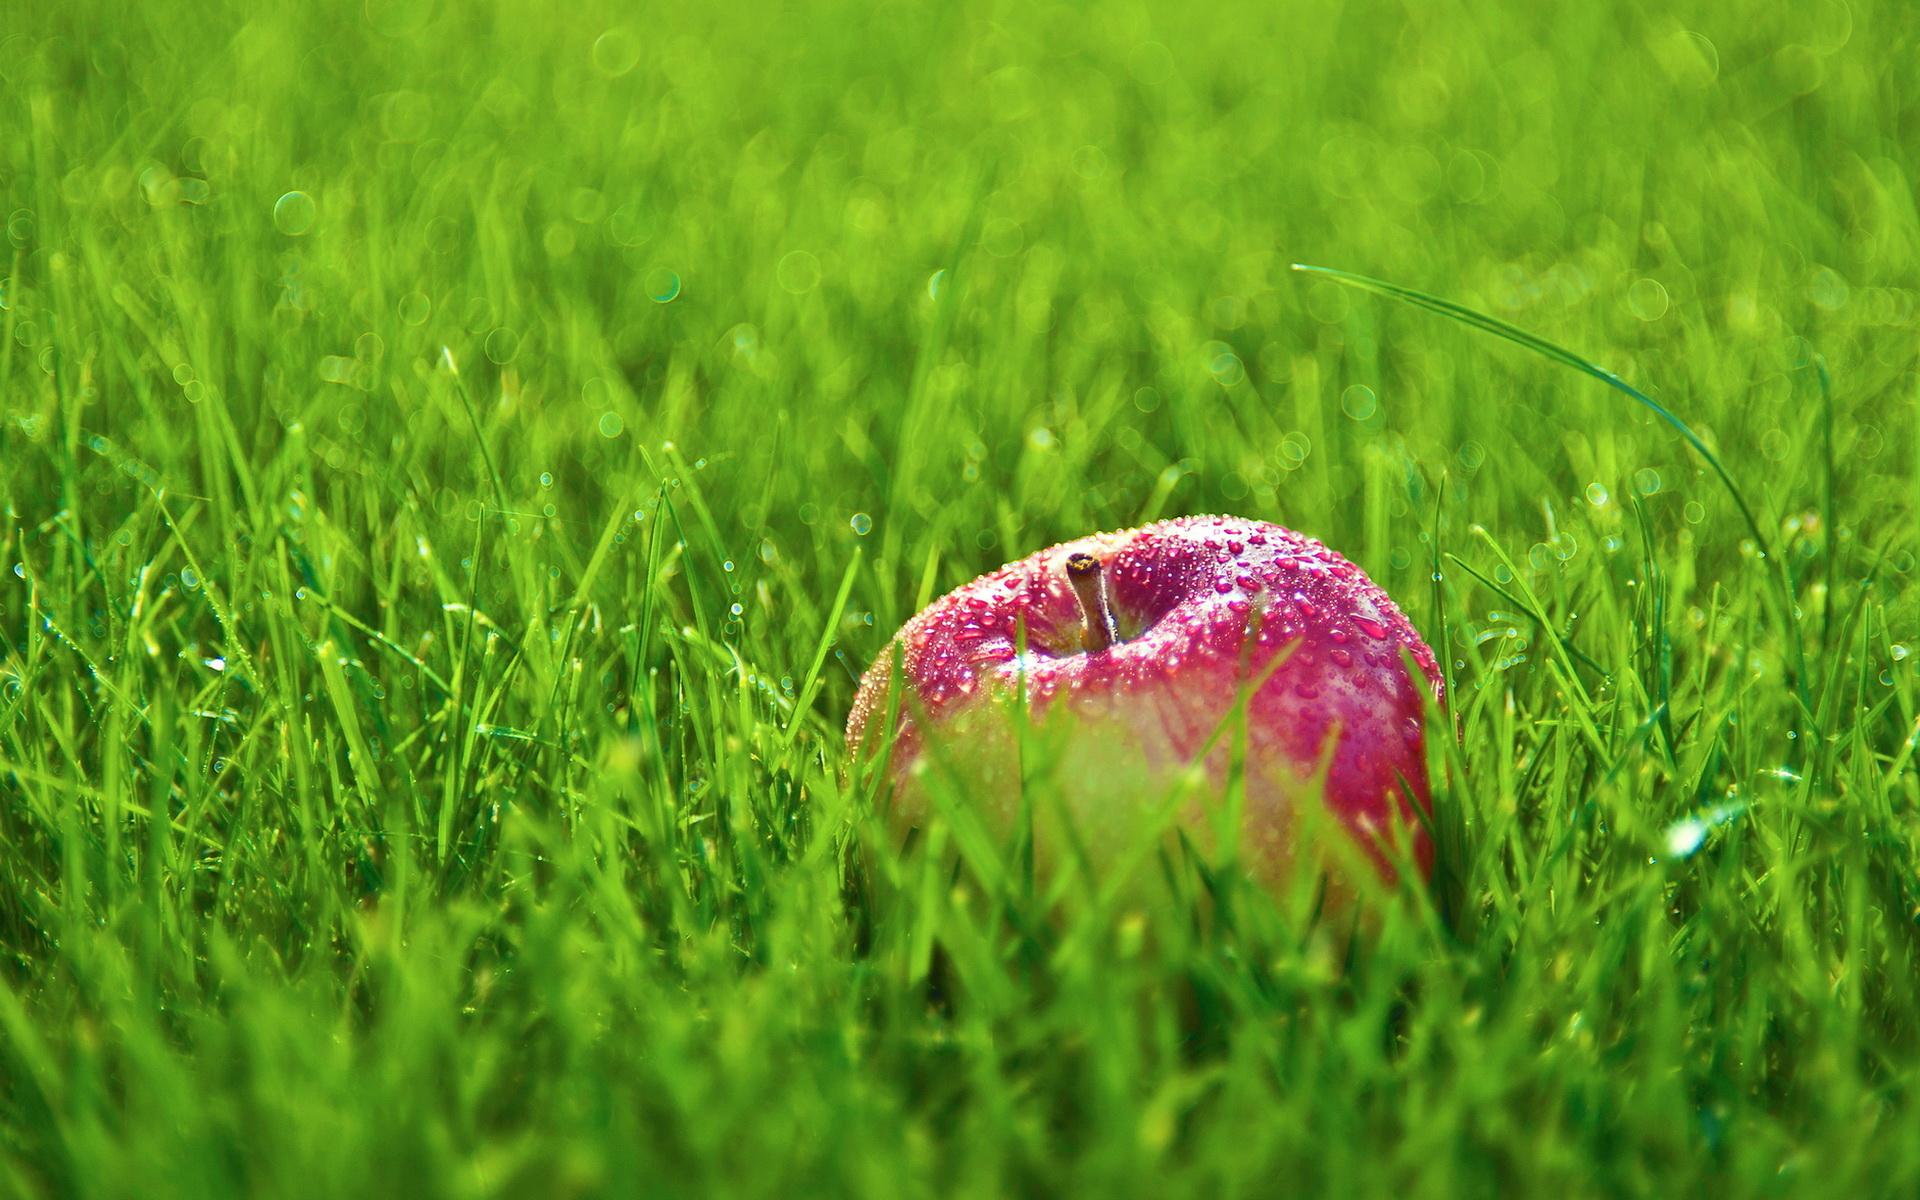 apple fruit background grass - photo #7